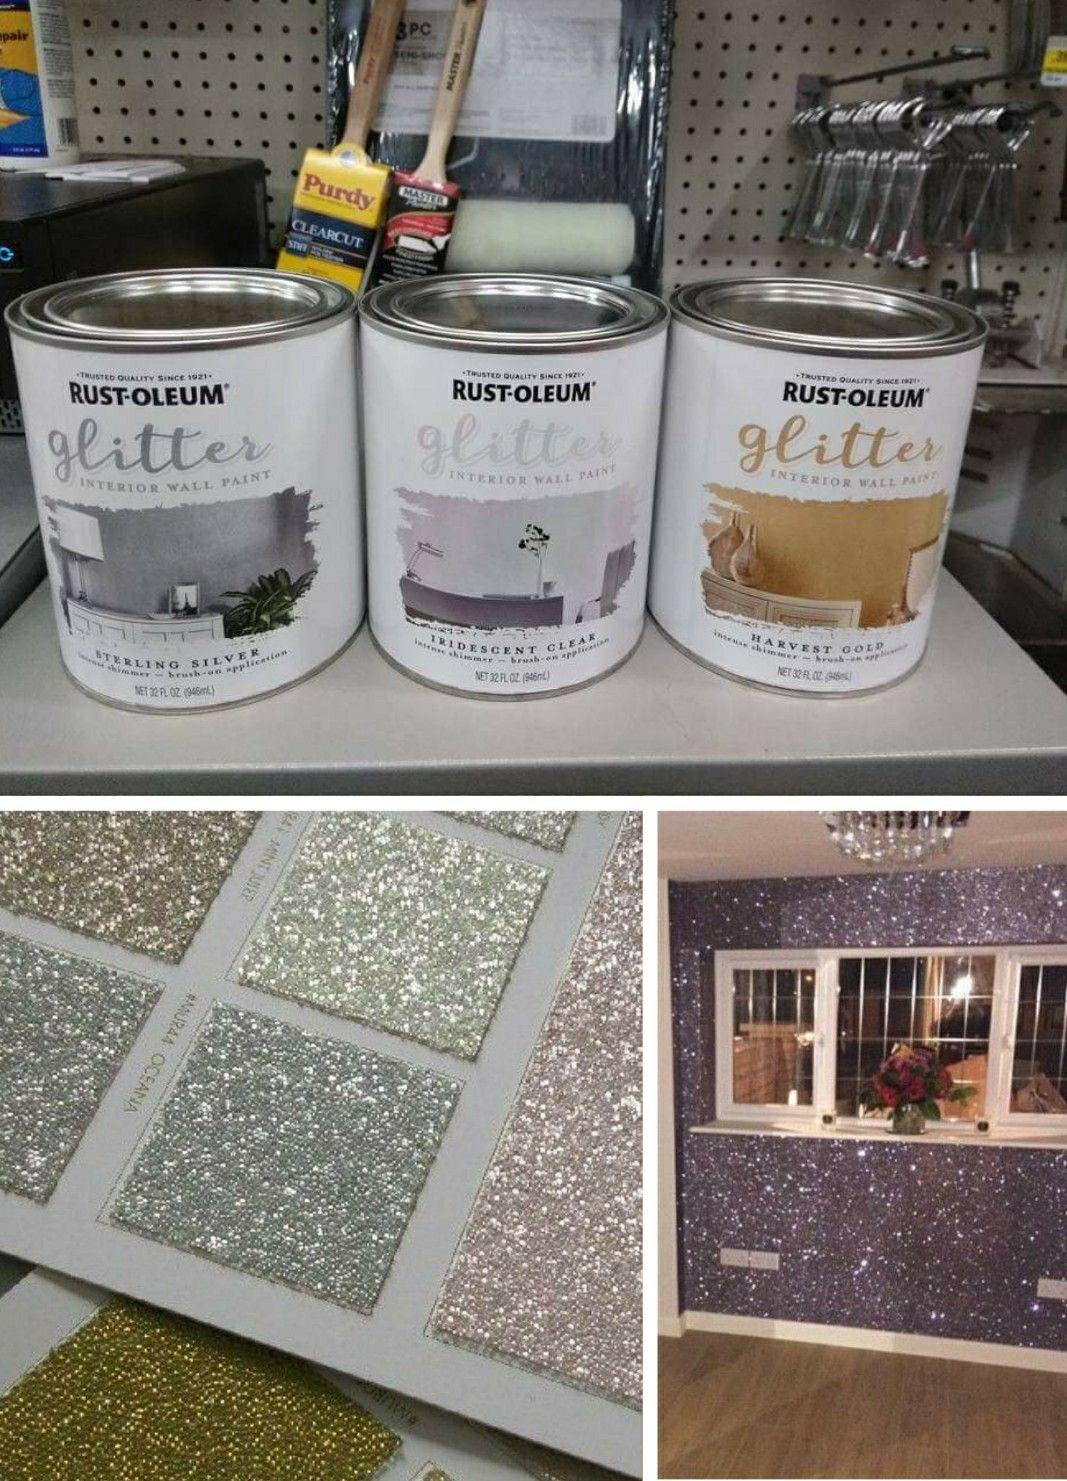 Interieur farbgestaltung des raumes rustoleum glitter paint  deko selber machen  pinterest